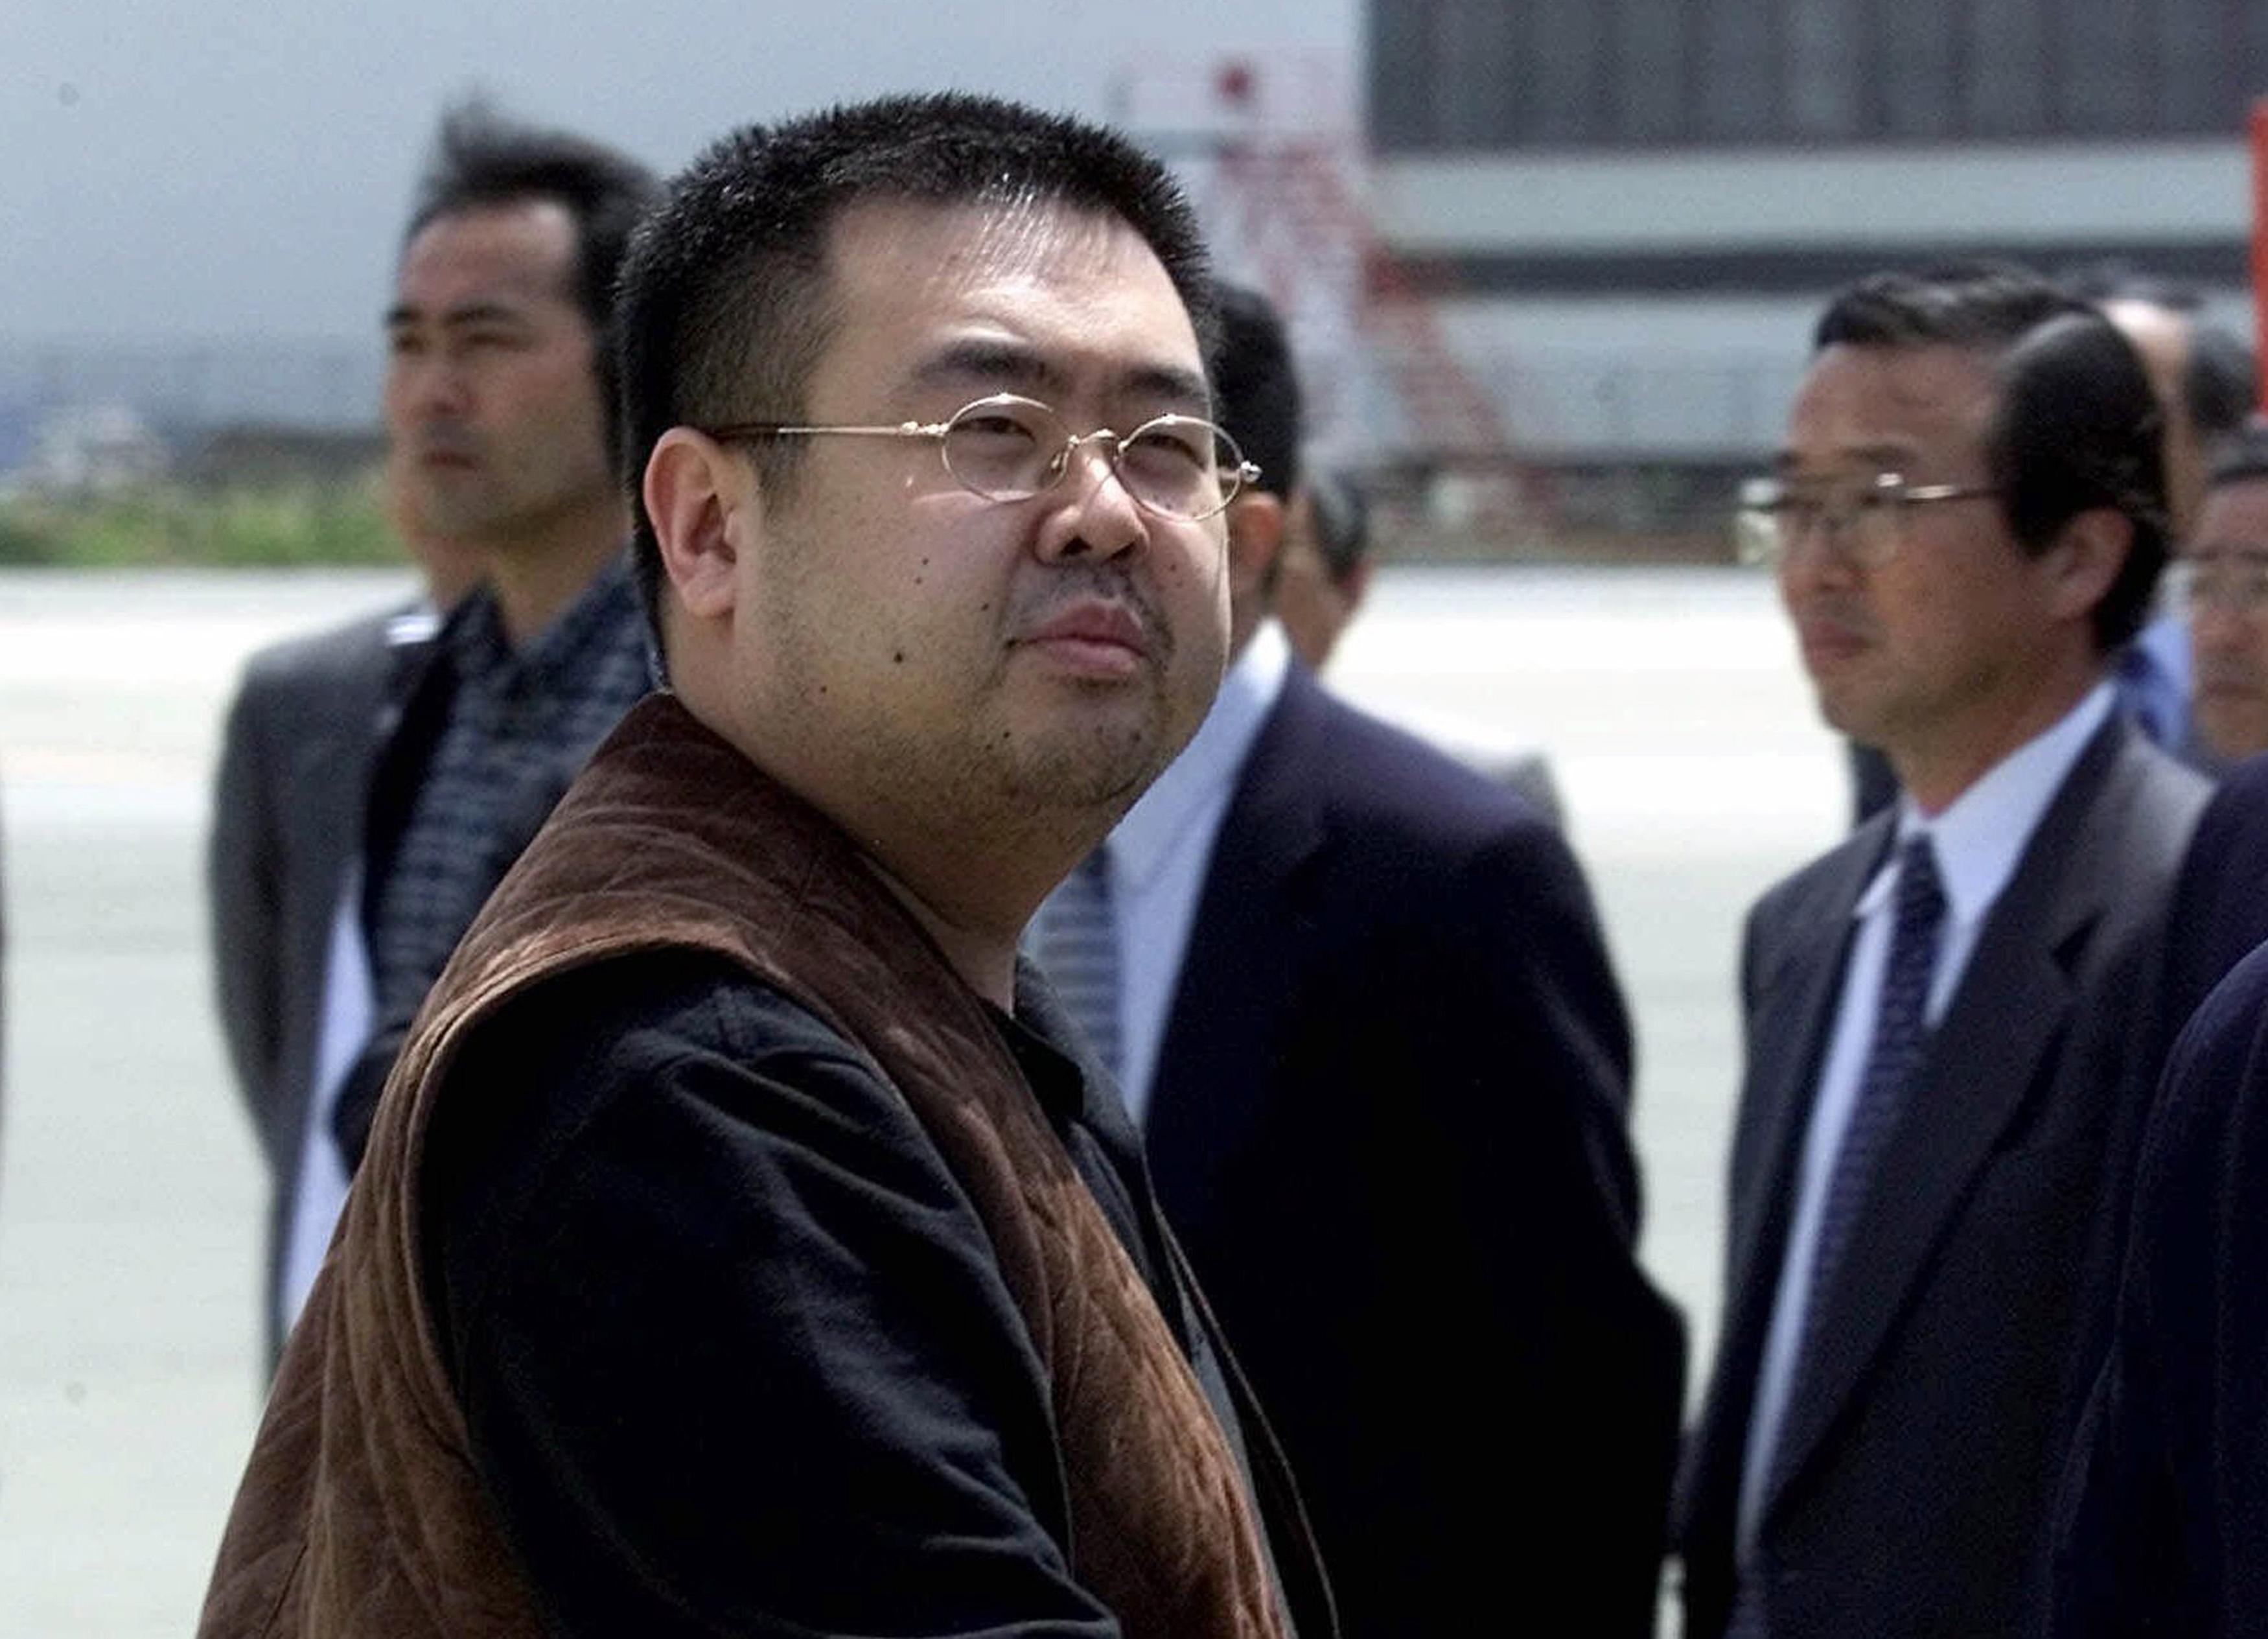 A man believed to be Kim Jong Nam, the eldest son of then North Korean leader Kim Jong Il. (AP Photo/Shizuo Kambayashi, File)